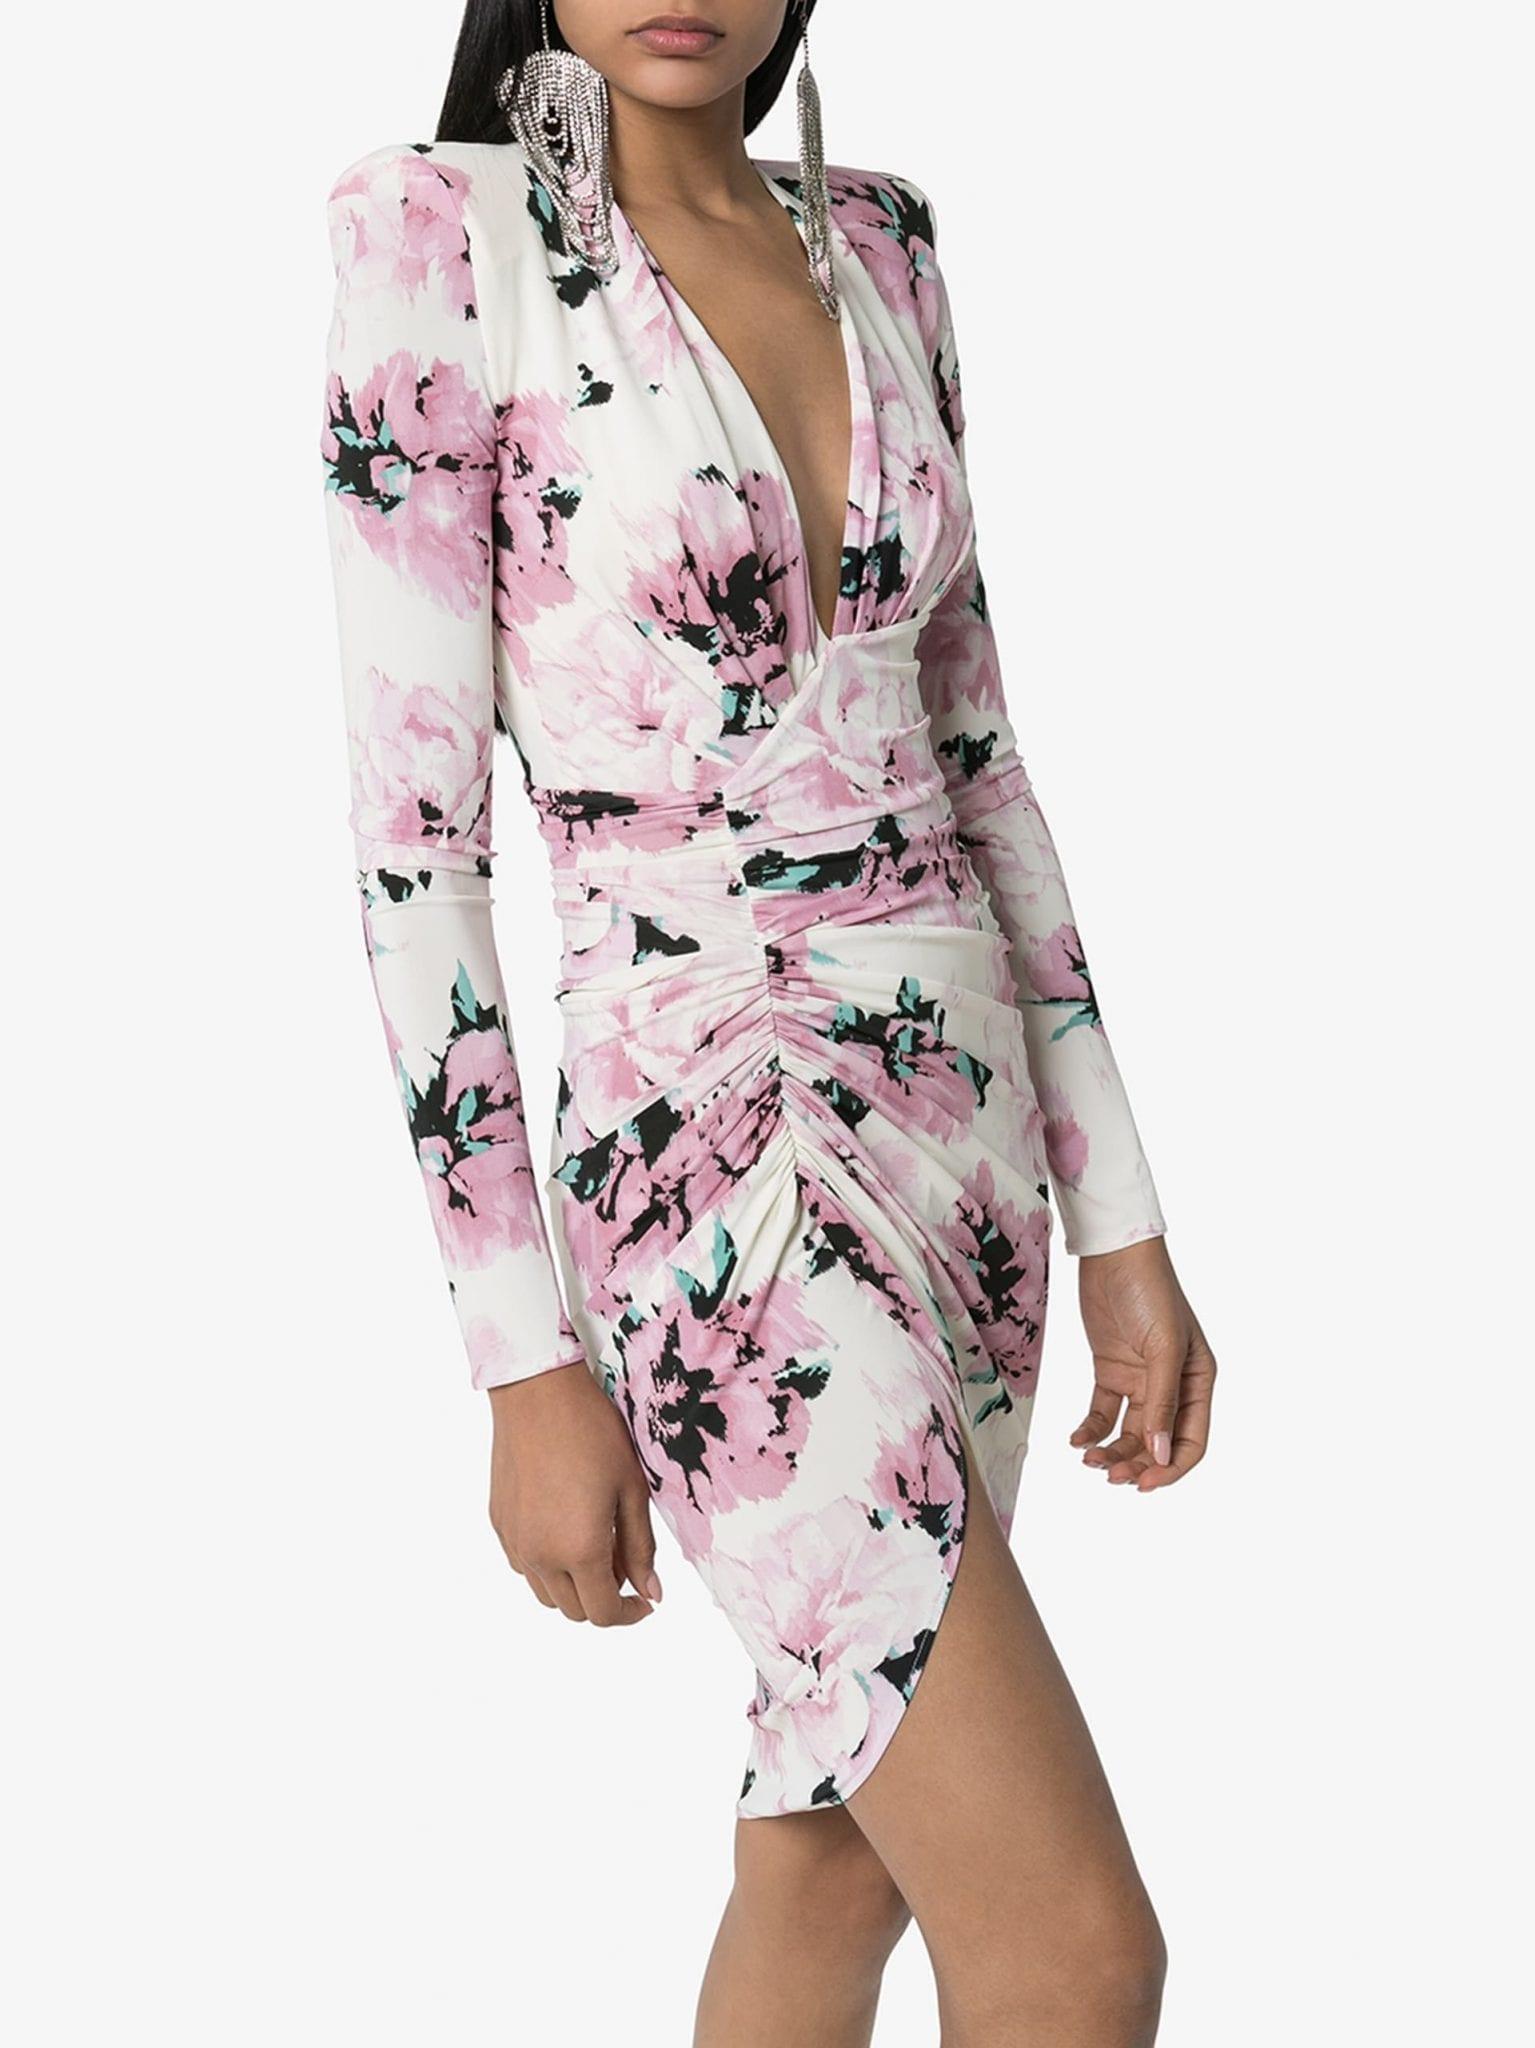 ALEXANDRE VAUTHIER Ruched Floral Print Mini Dress